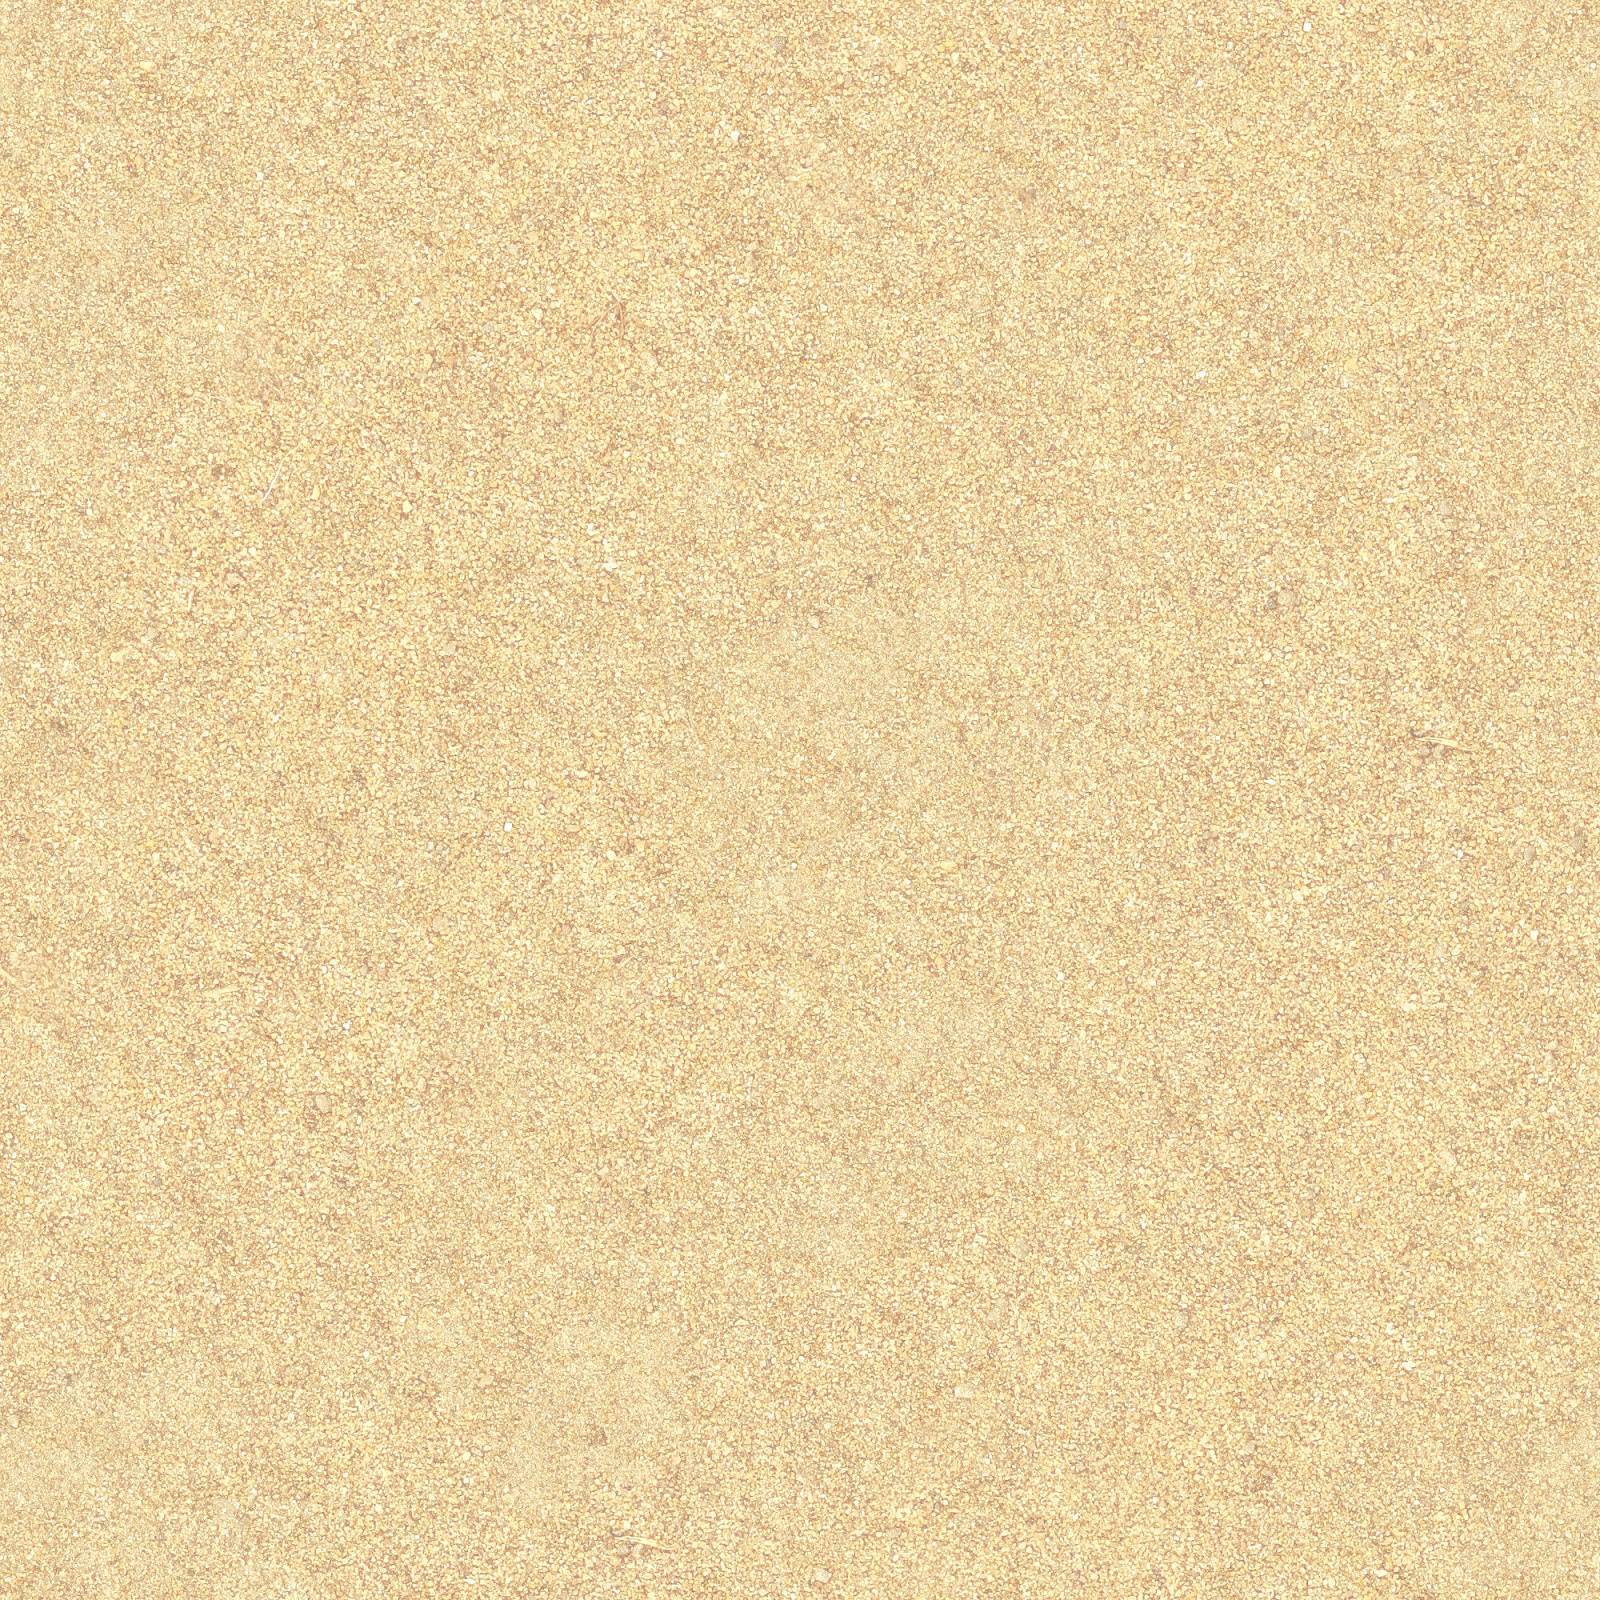 High Resolution Seamless Textures: Ground